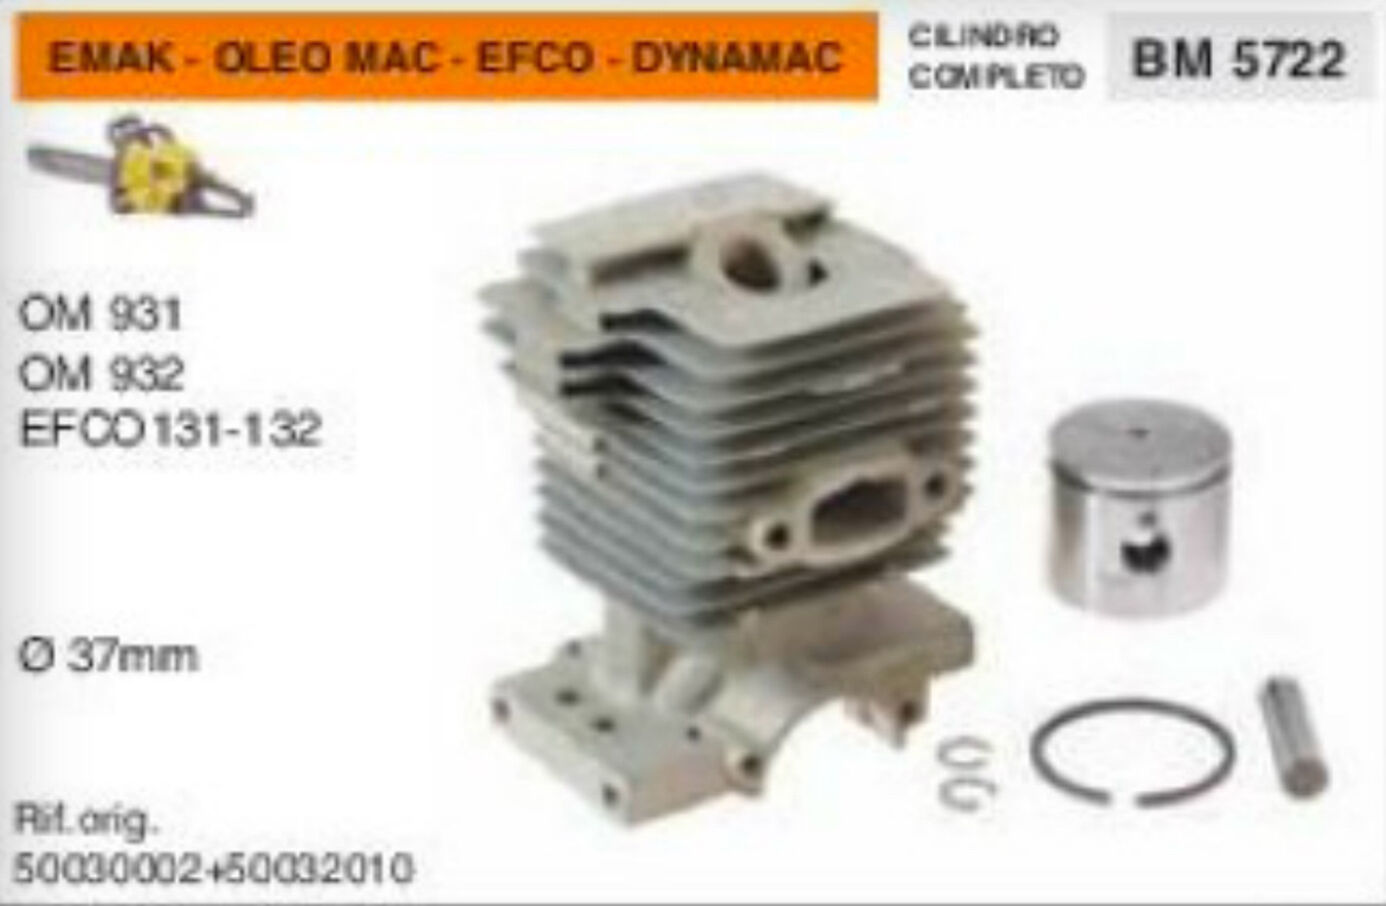 Cylindre Piston Scie à Chaîne Emak Oleo Mac 931 932 Efco 131 132 Dynamac Ø 37 Mm